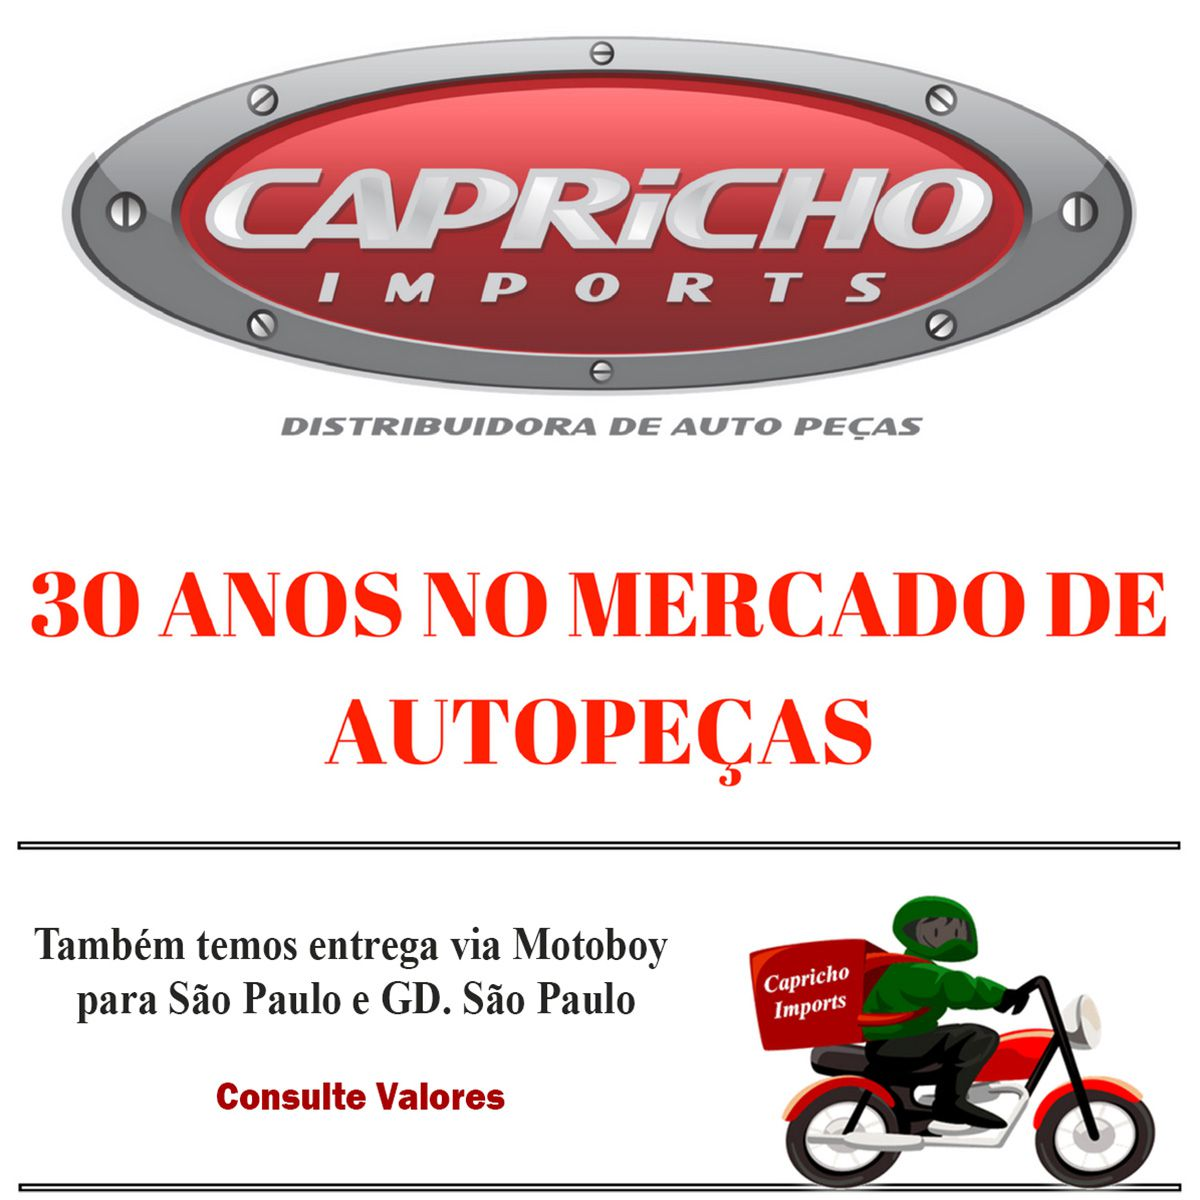 Pastilha de freio Traseiro C250 / C300 / E250 / E300 / 250 / AMG 43